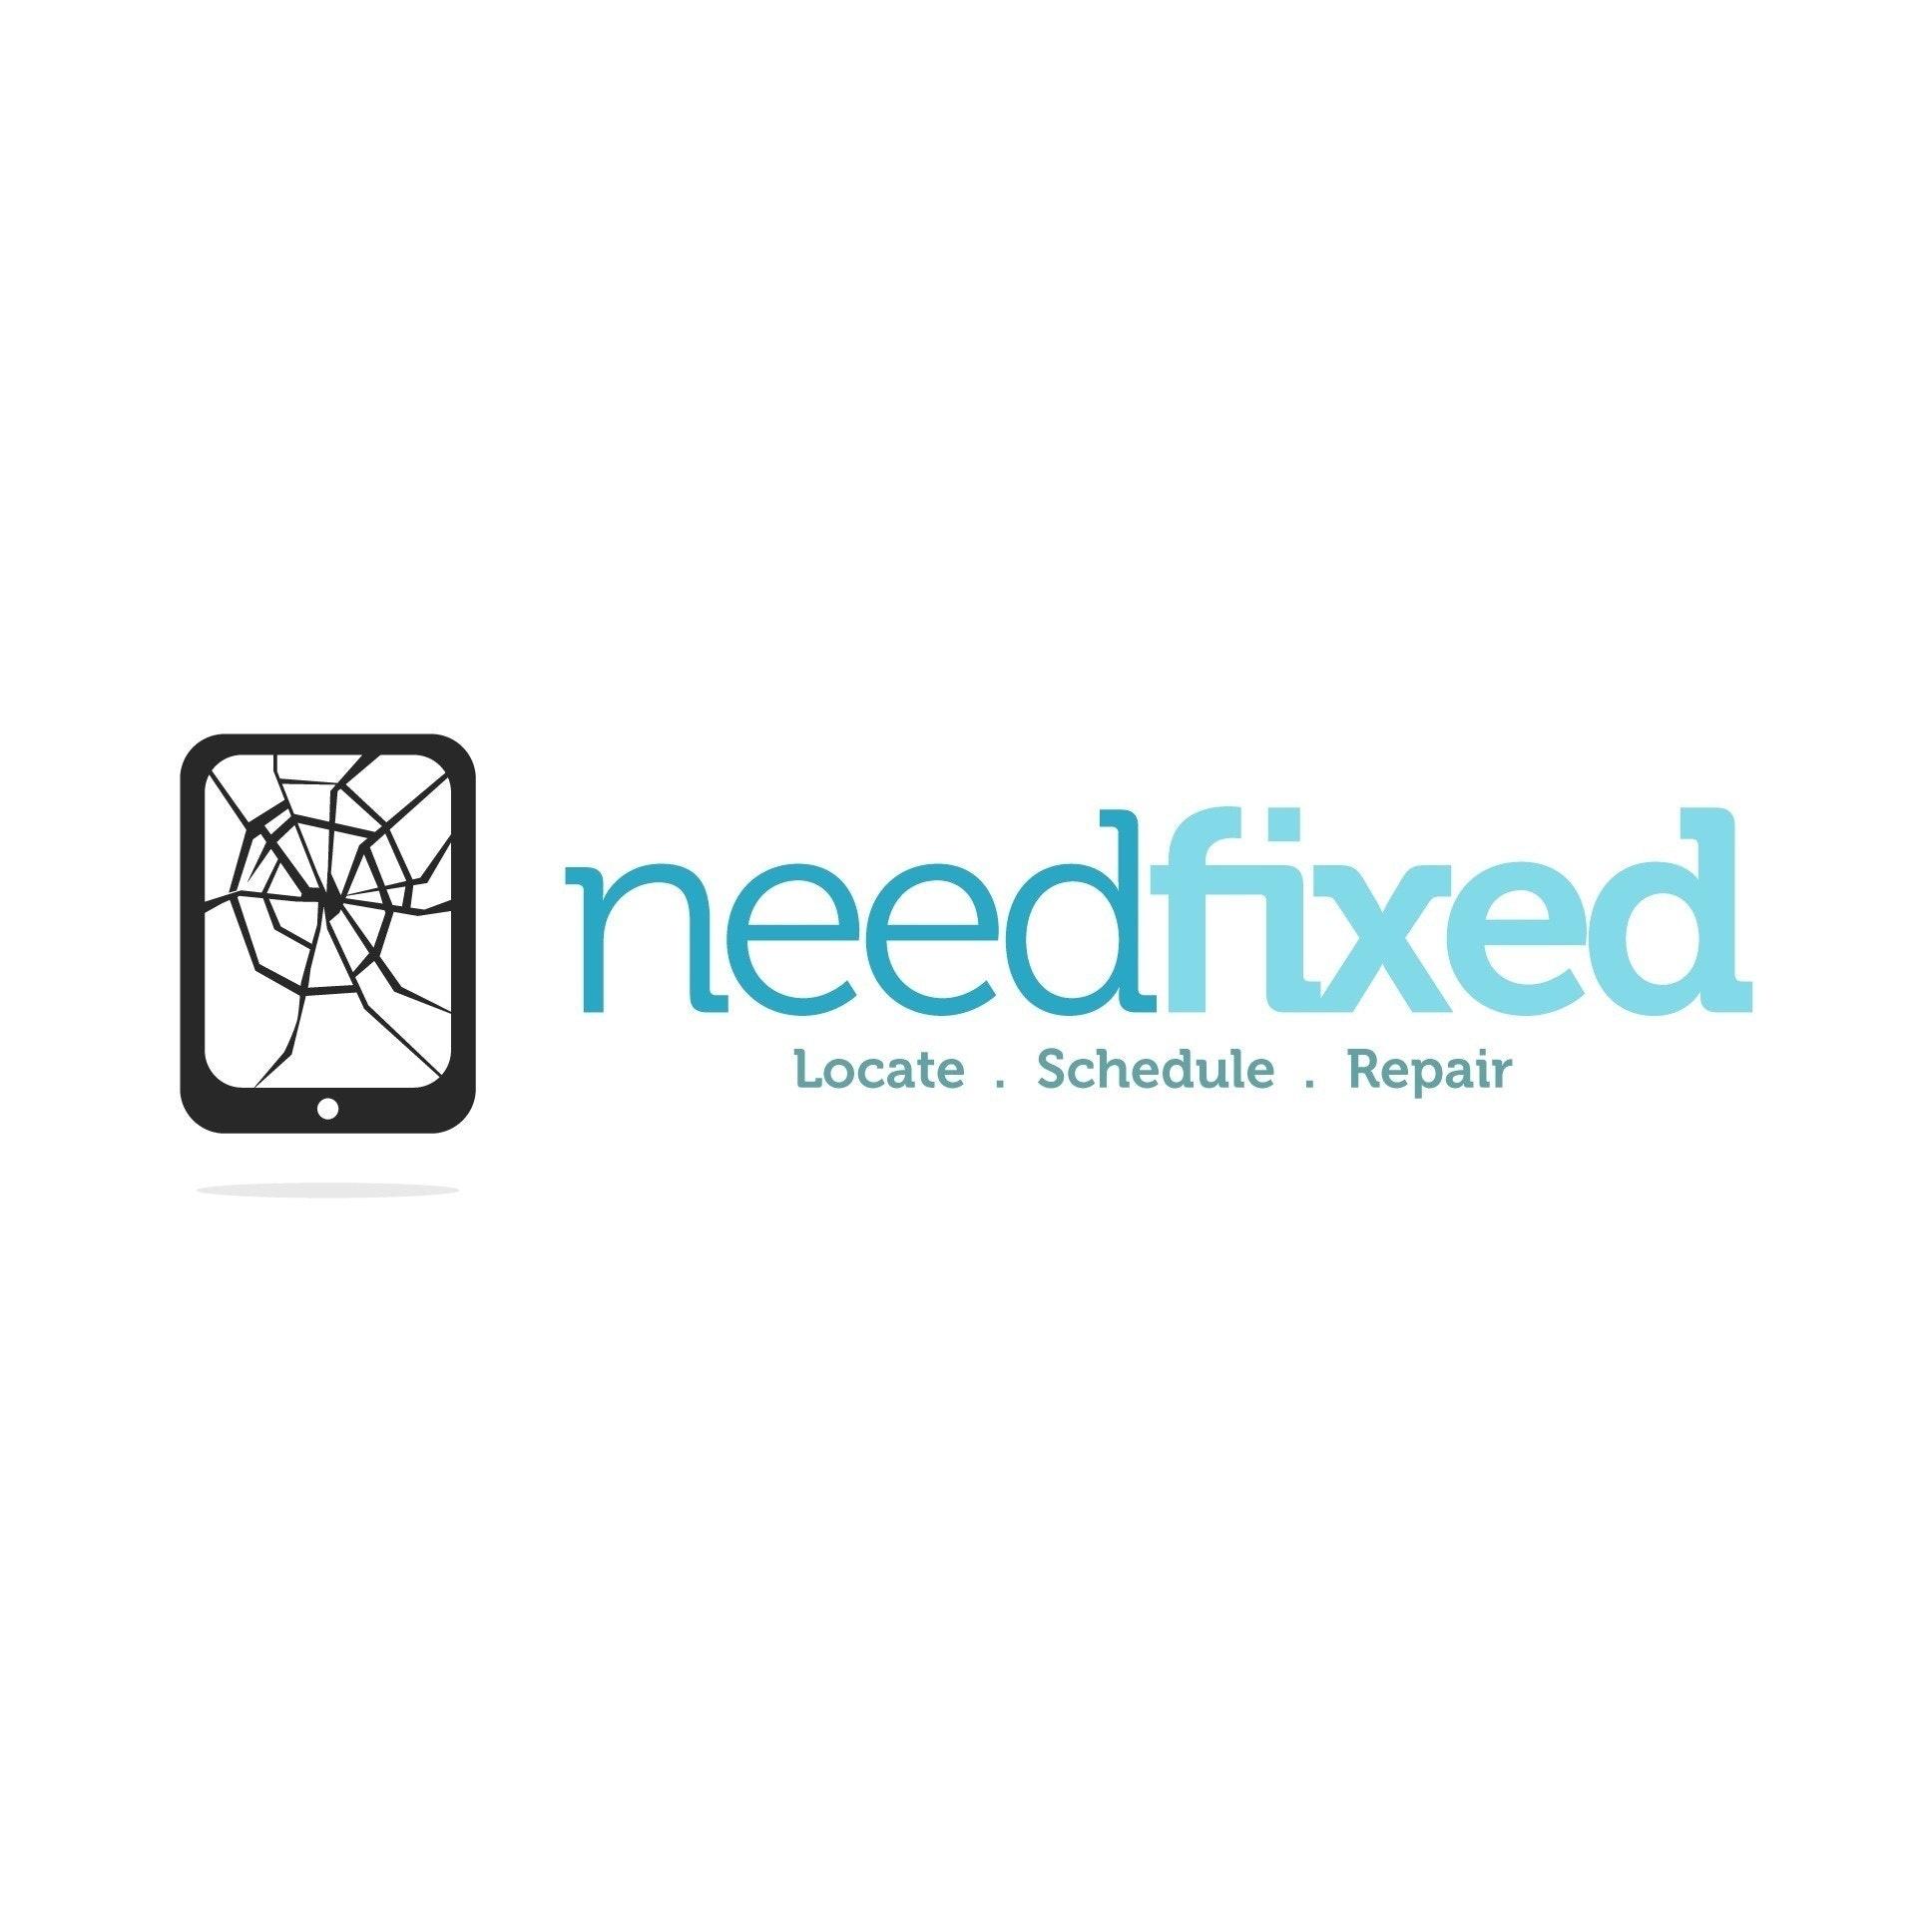 NeedFixed.com